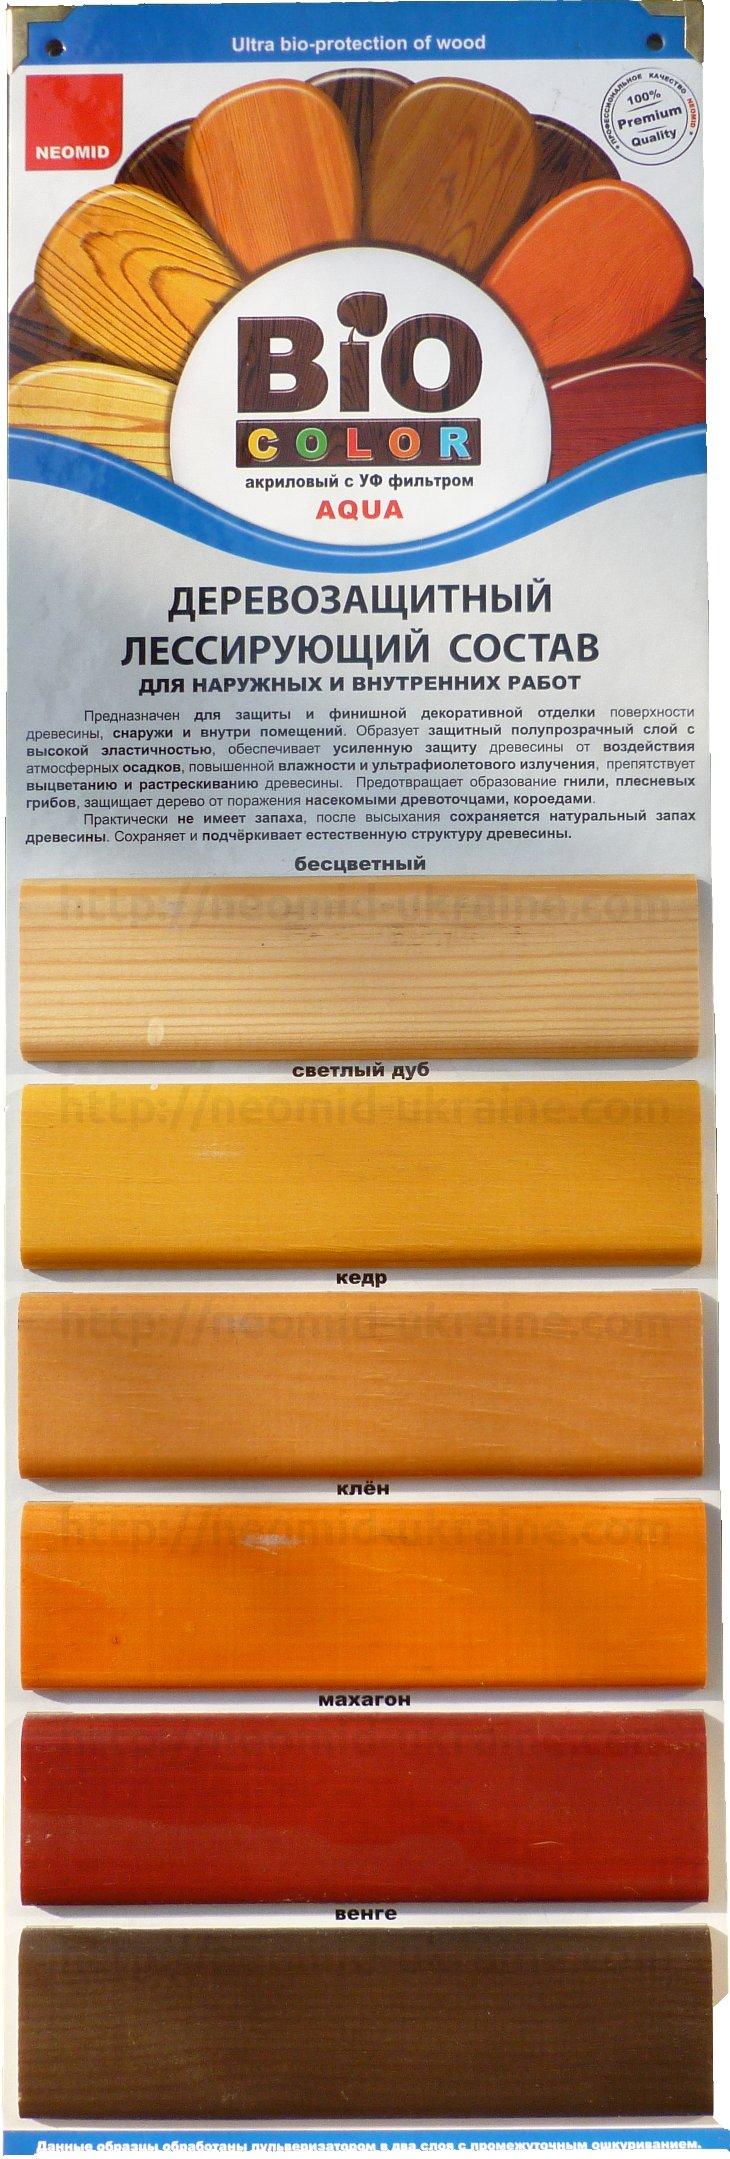 Цветовая палитра лессирующего антисептика Neomid Bio Color Aqua.